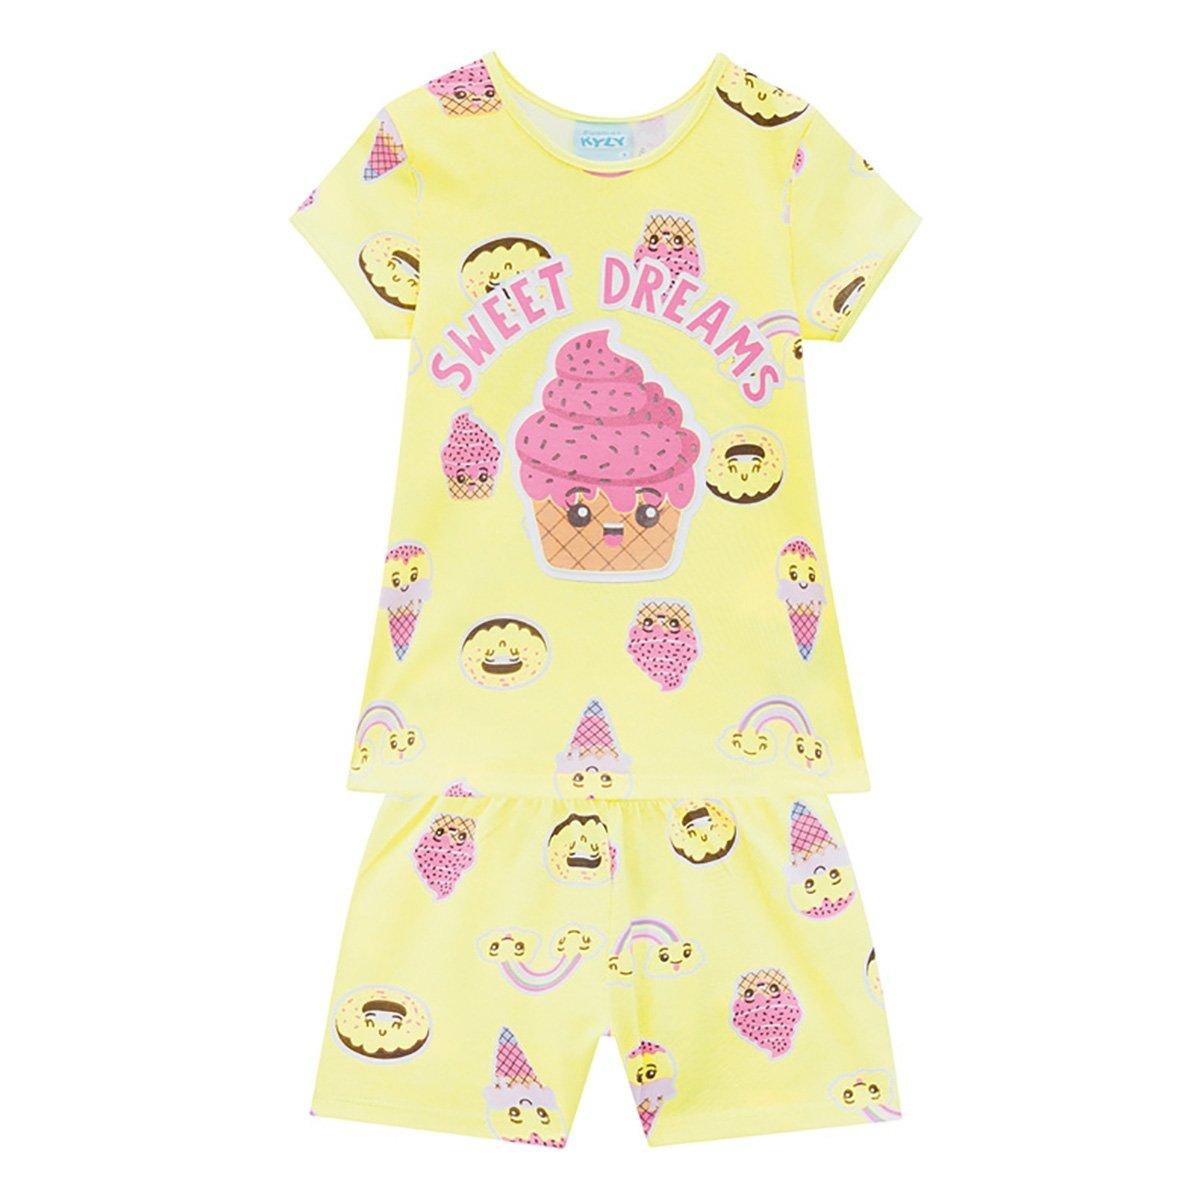 Pijama Infantil Kyly Sweet Dreams Brilha no Escuro Feminino